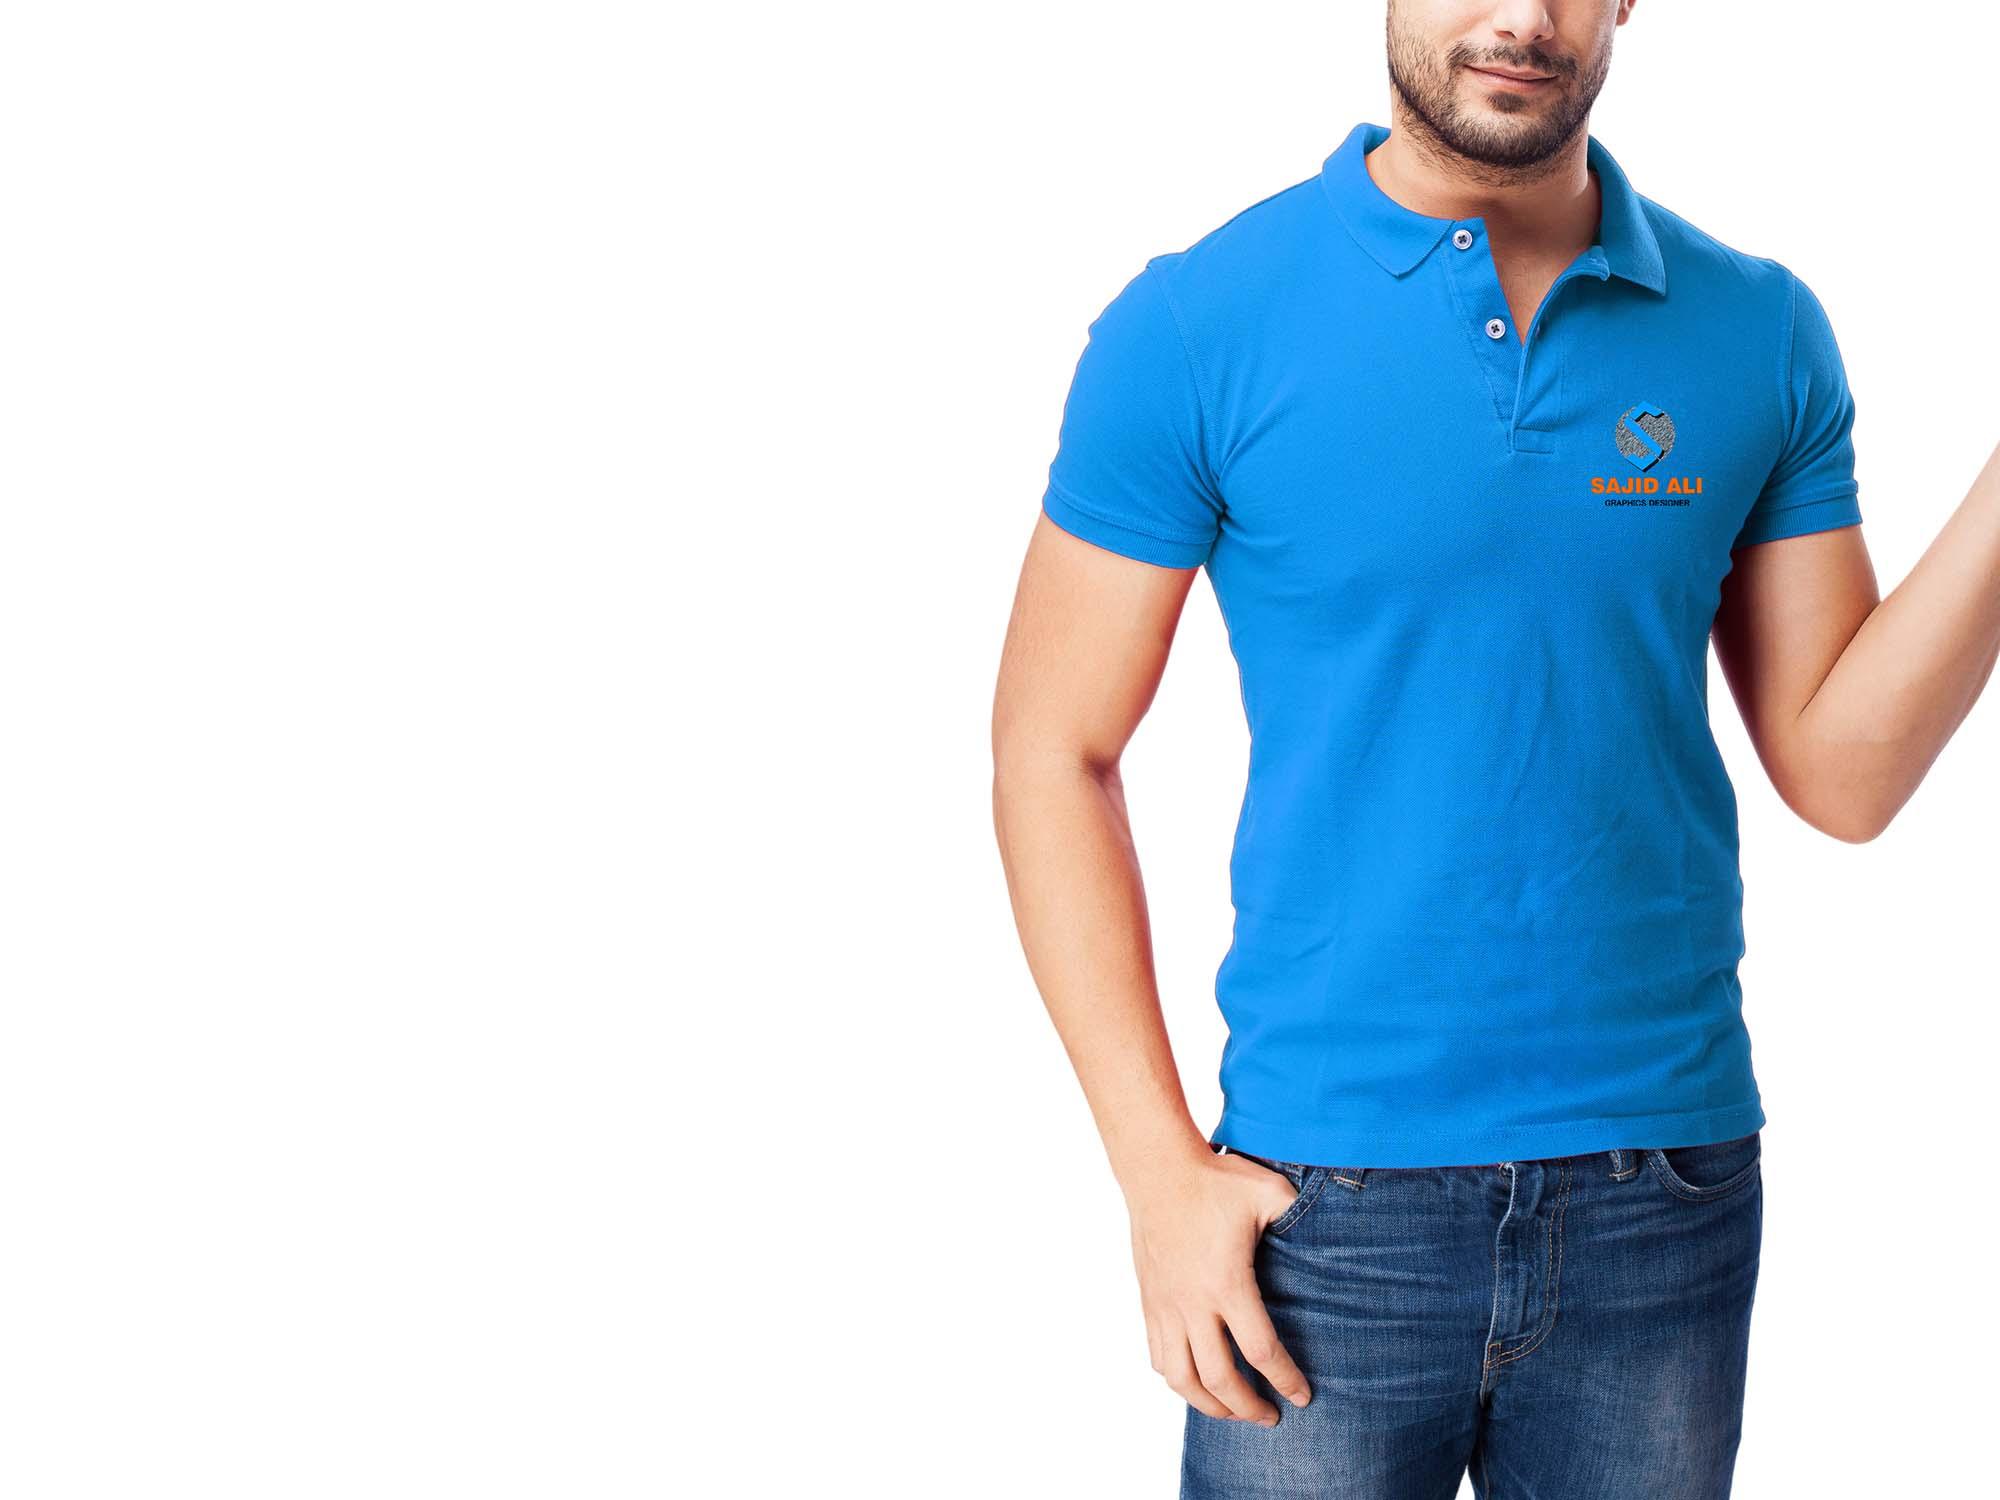 Polo T-Shirt Mockup 2